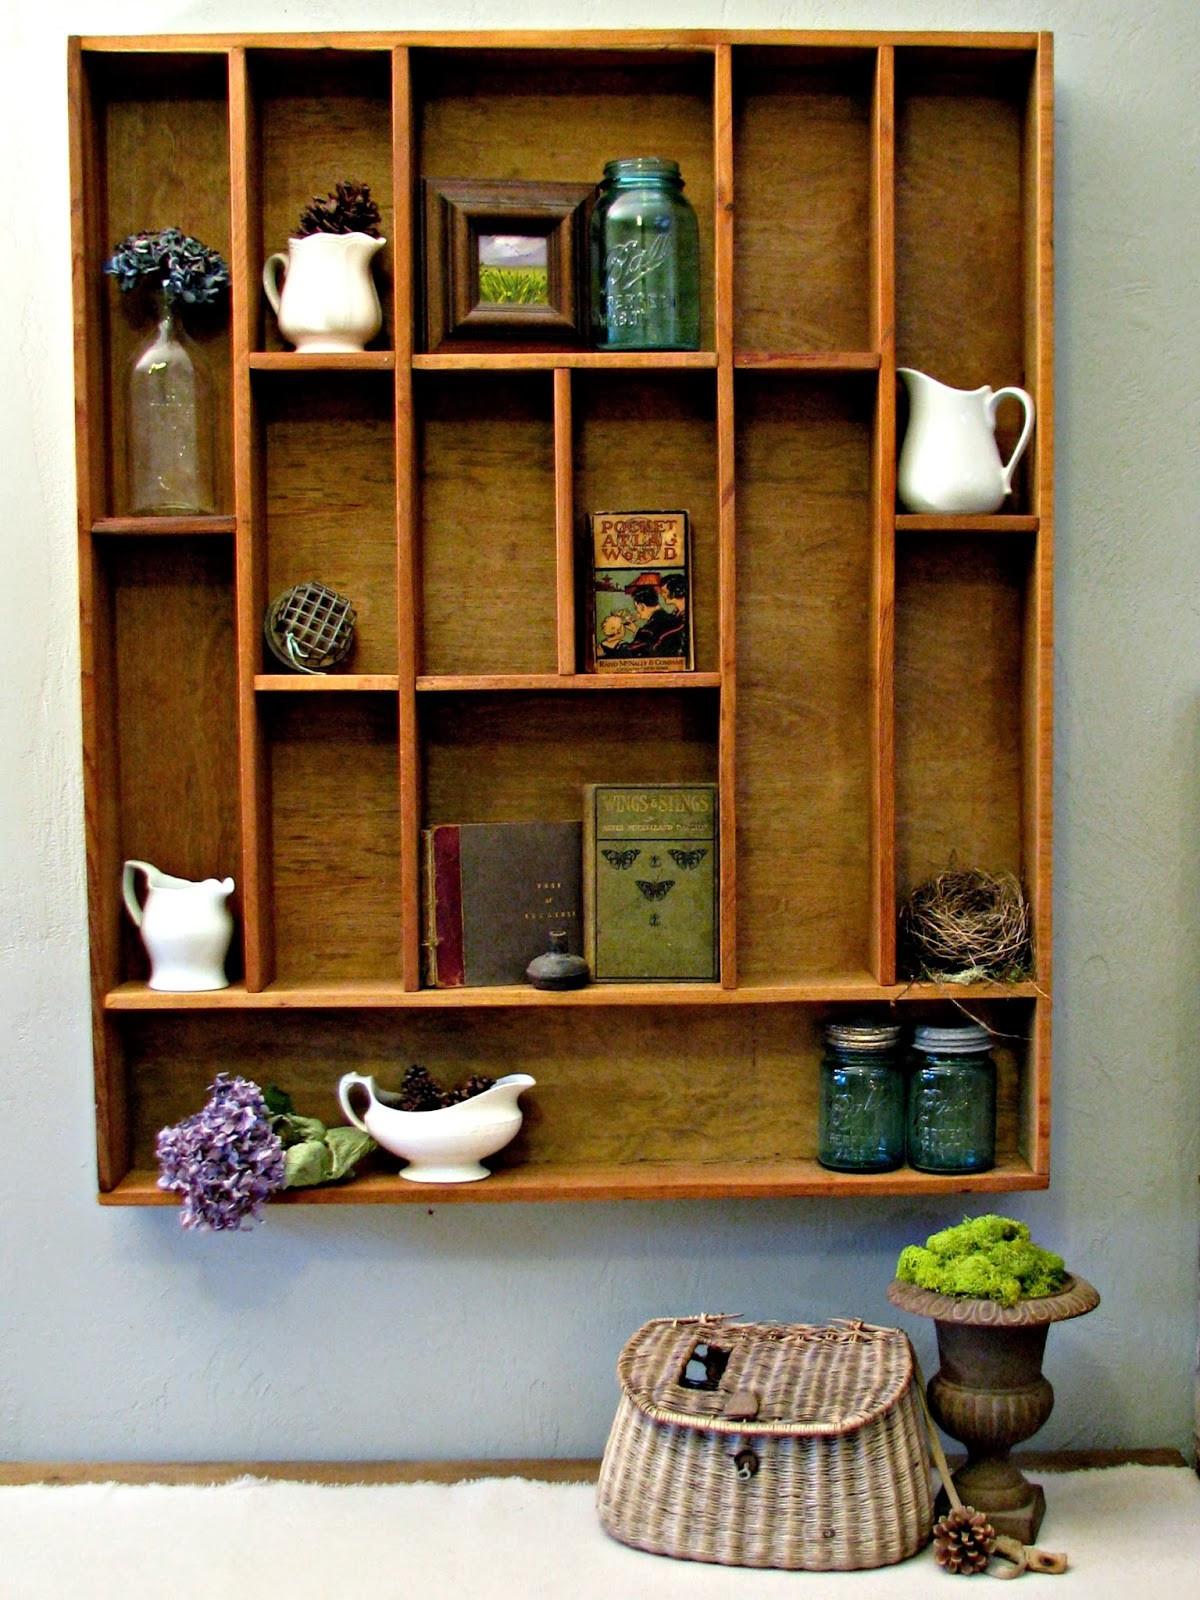 DIY Wood Shelf  blue roof cabin DIY Letterpress Tray Display Shelf Tutorial